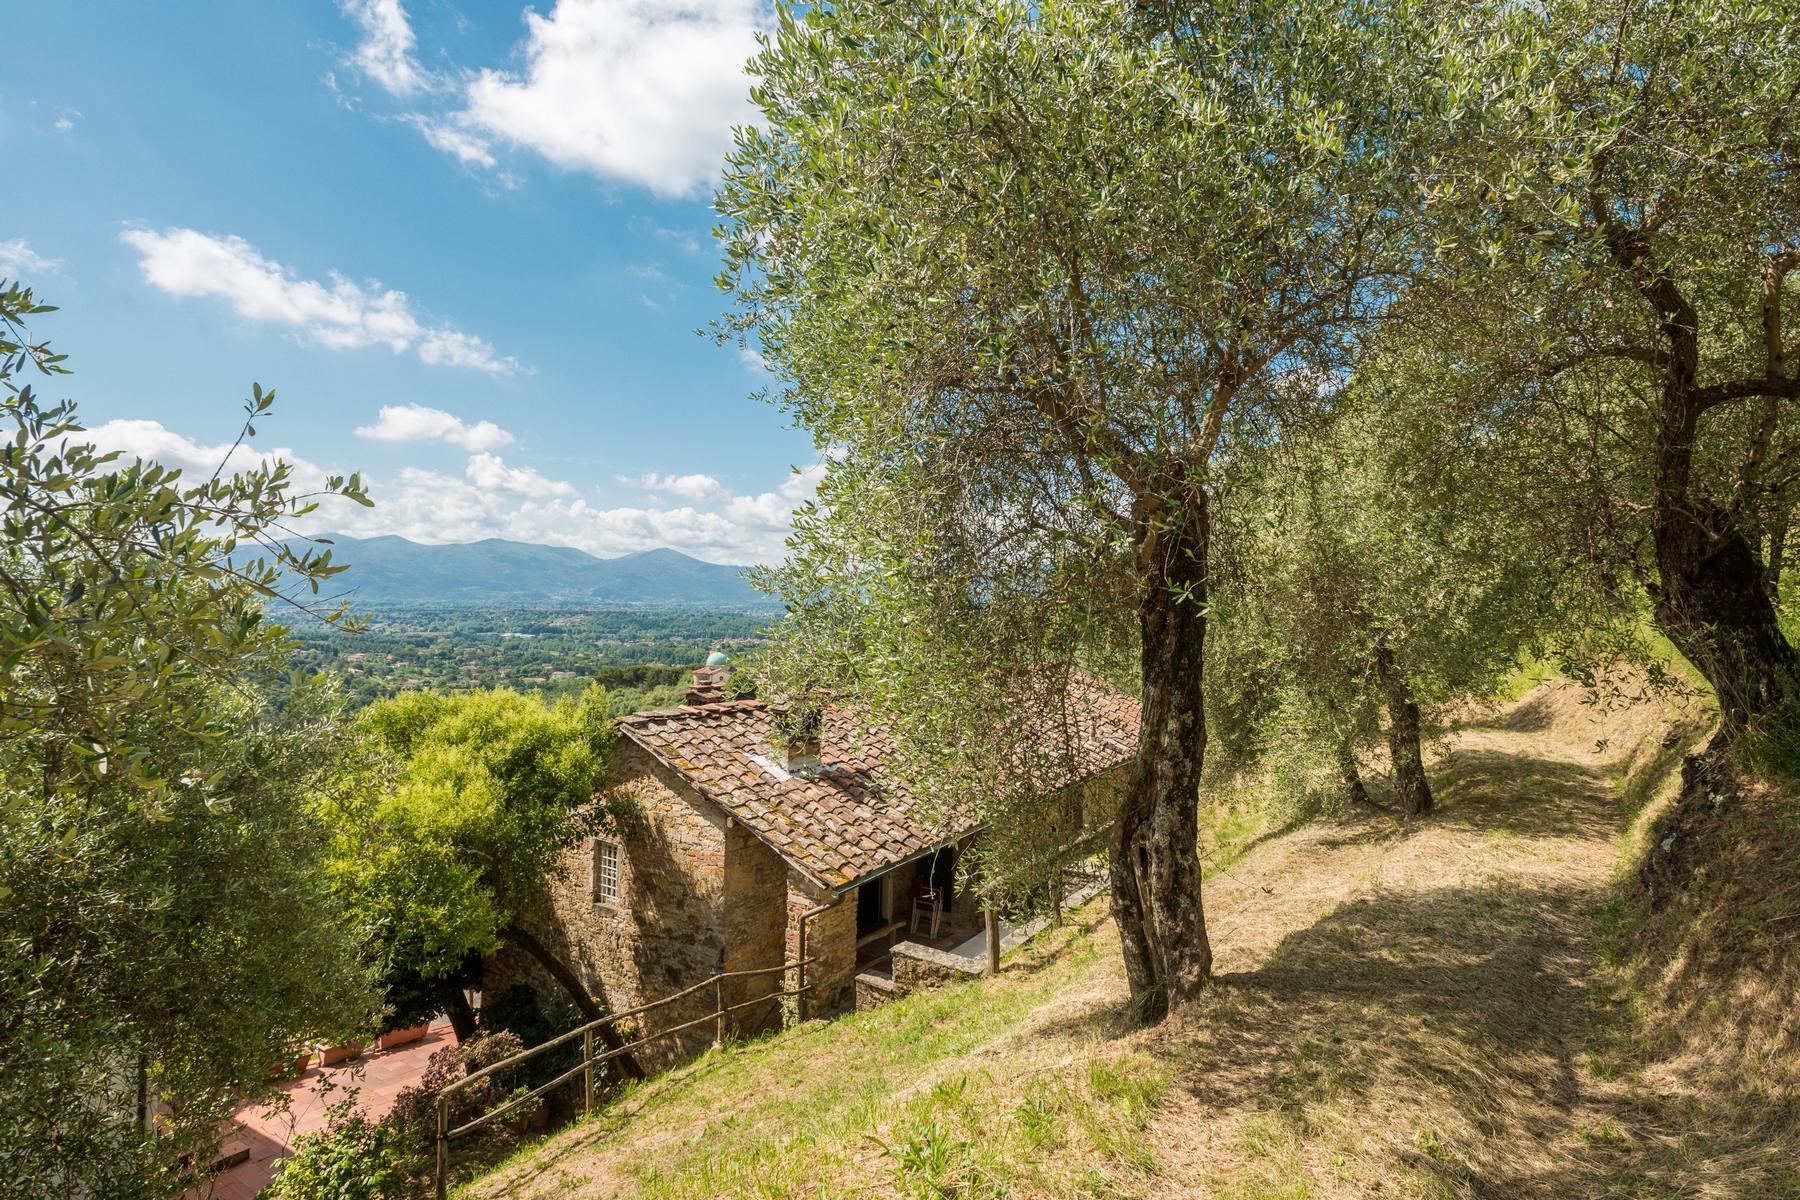 Villa in Vendita a Lucca: 5 locali, 550 mq - Foto 19